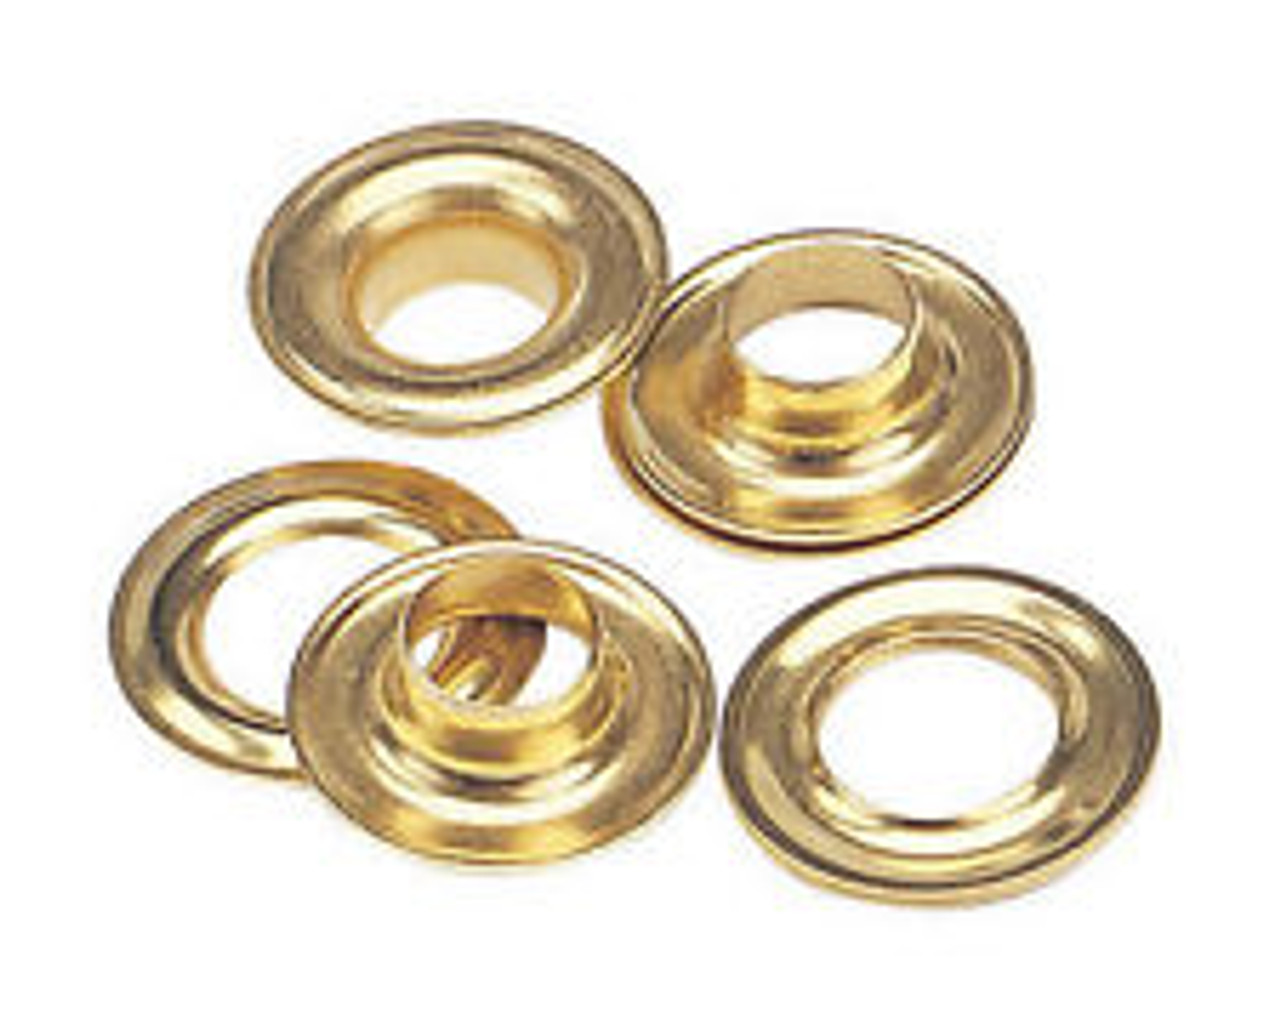 Brass/Nickel Grommets (Sold Separately)